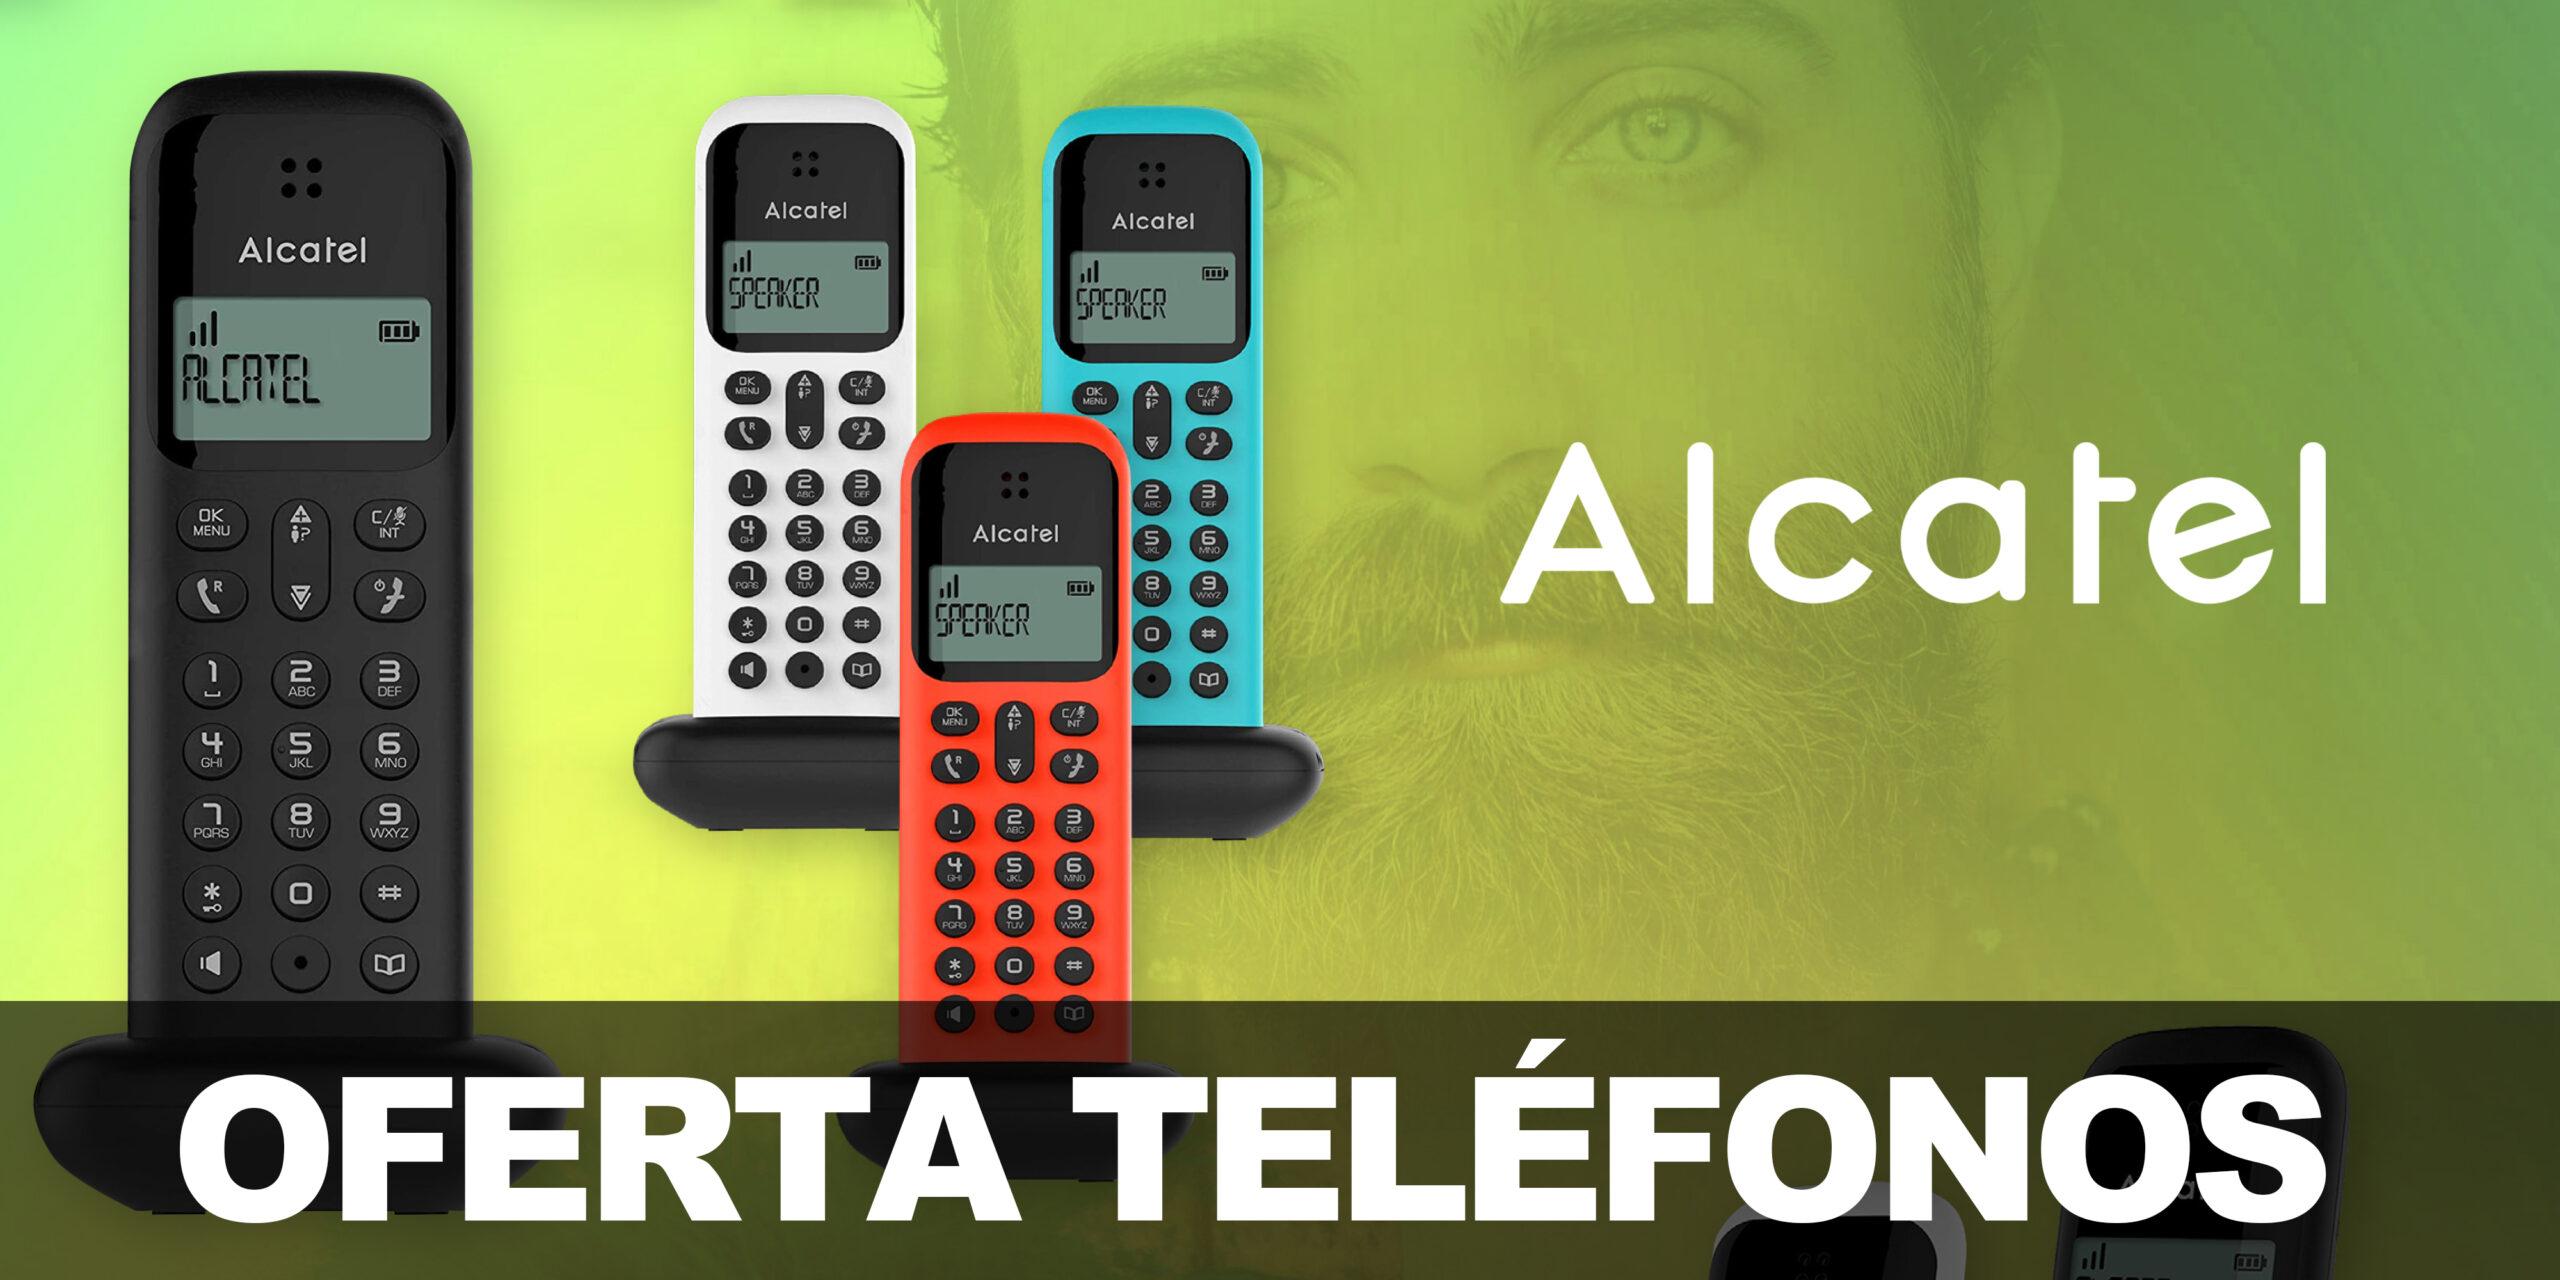 Oferta telefonos